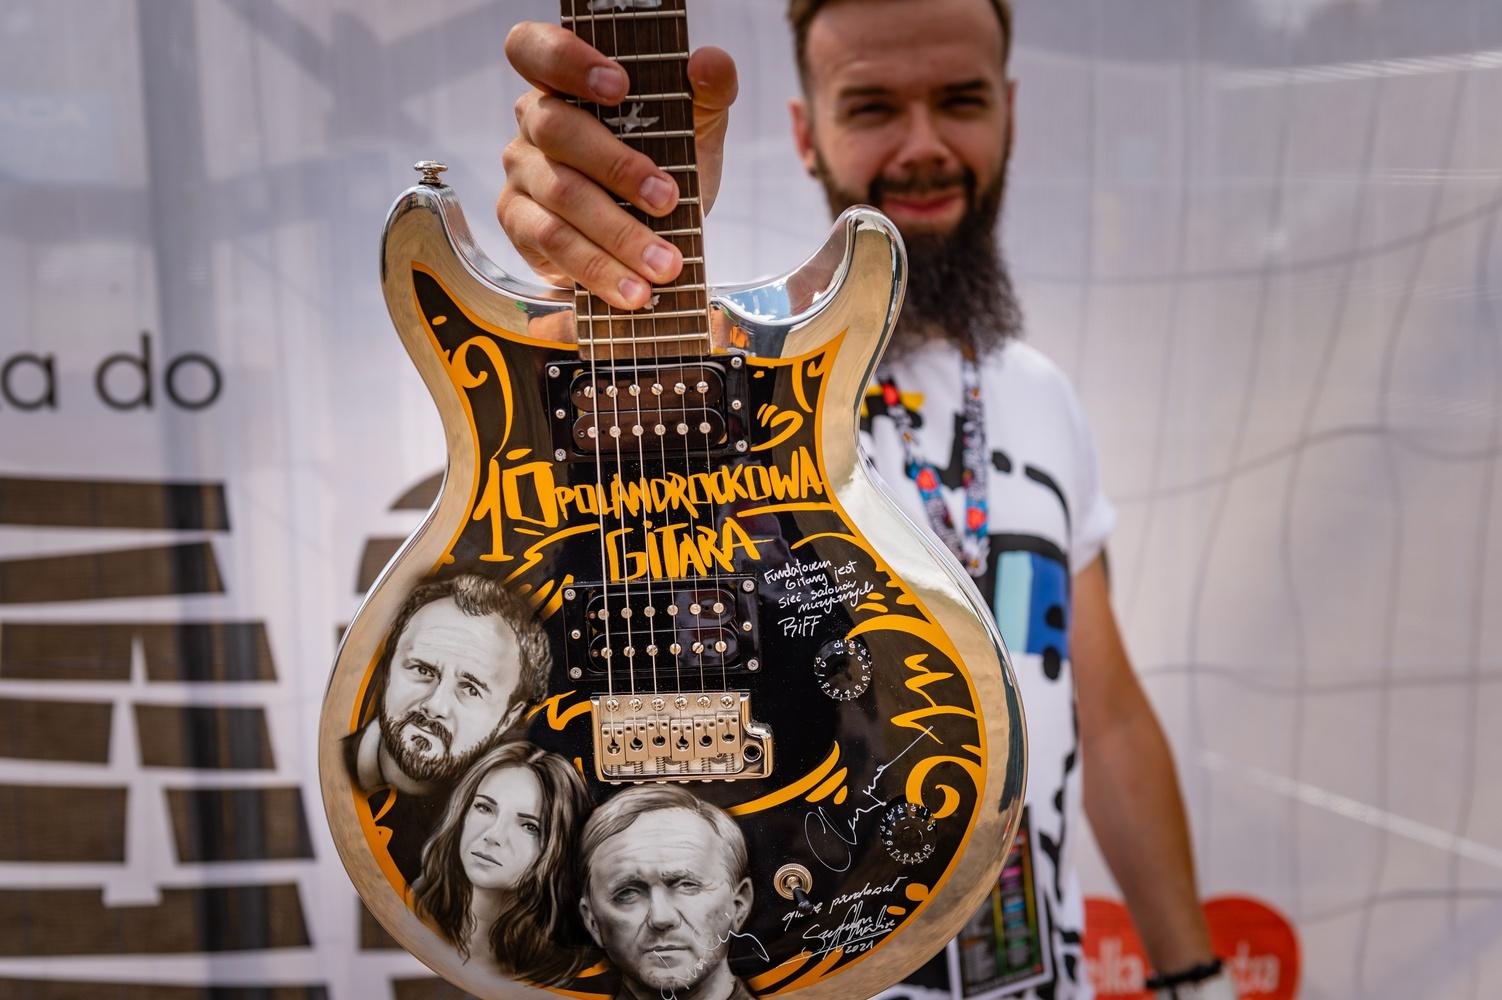 Front of the guitar with the images of Arkadiusz Jakubik, Kasia Kowalska and Andrzej Chyra (with an autograph) held by Szymon Chwalisz. photo by Paweł Krupka.